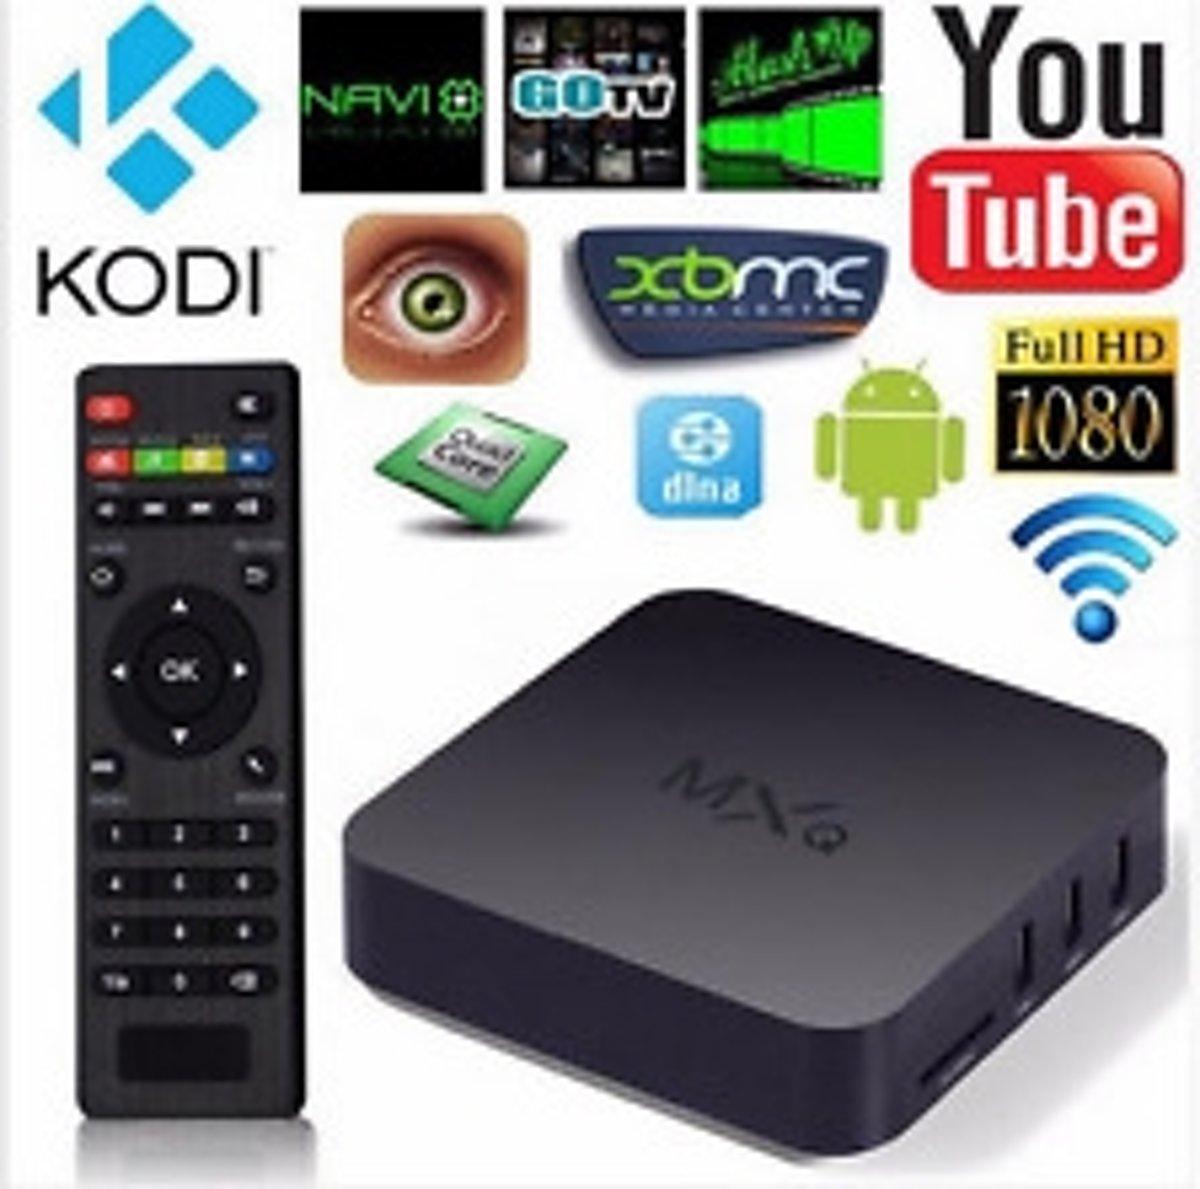 Android tv box MXQ + Kodi 16.1